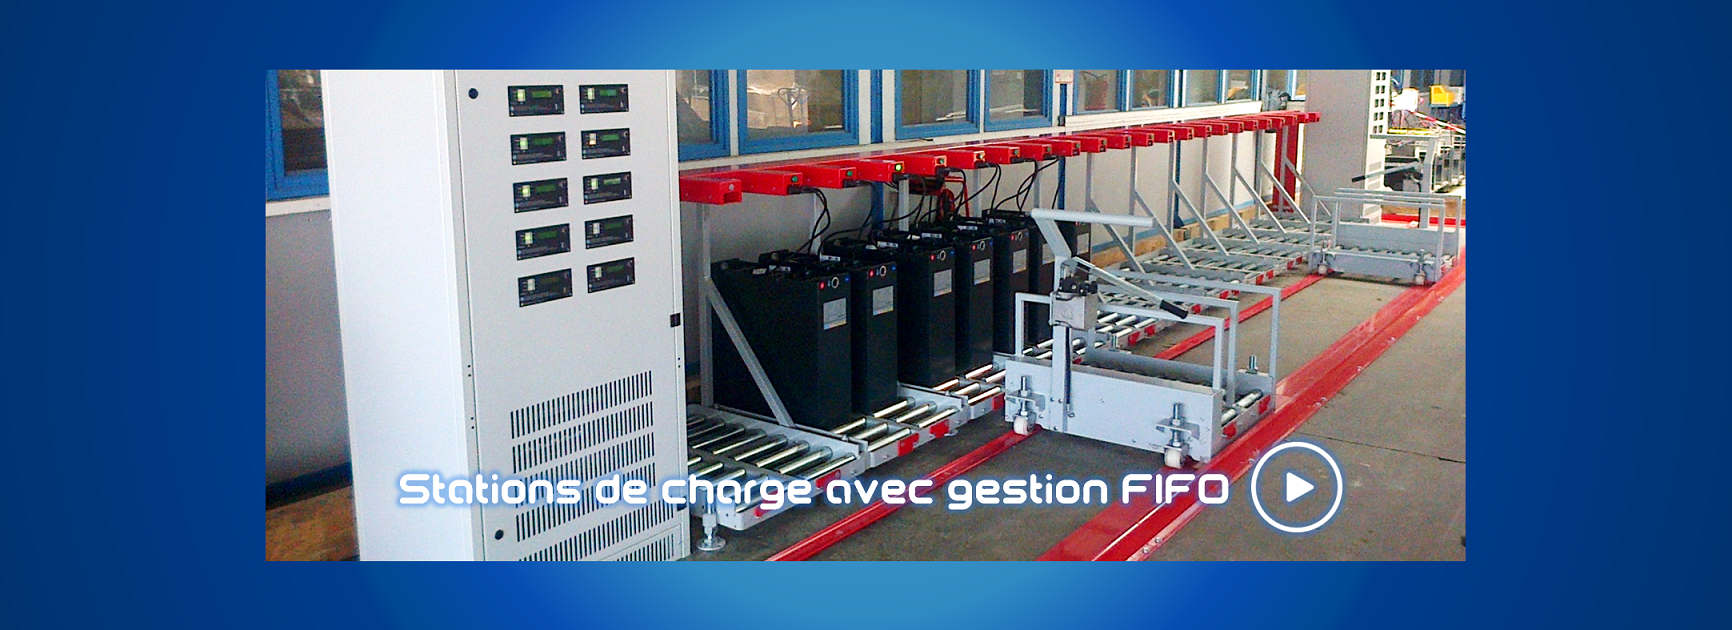 Stations-de-charge-FIFO-1